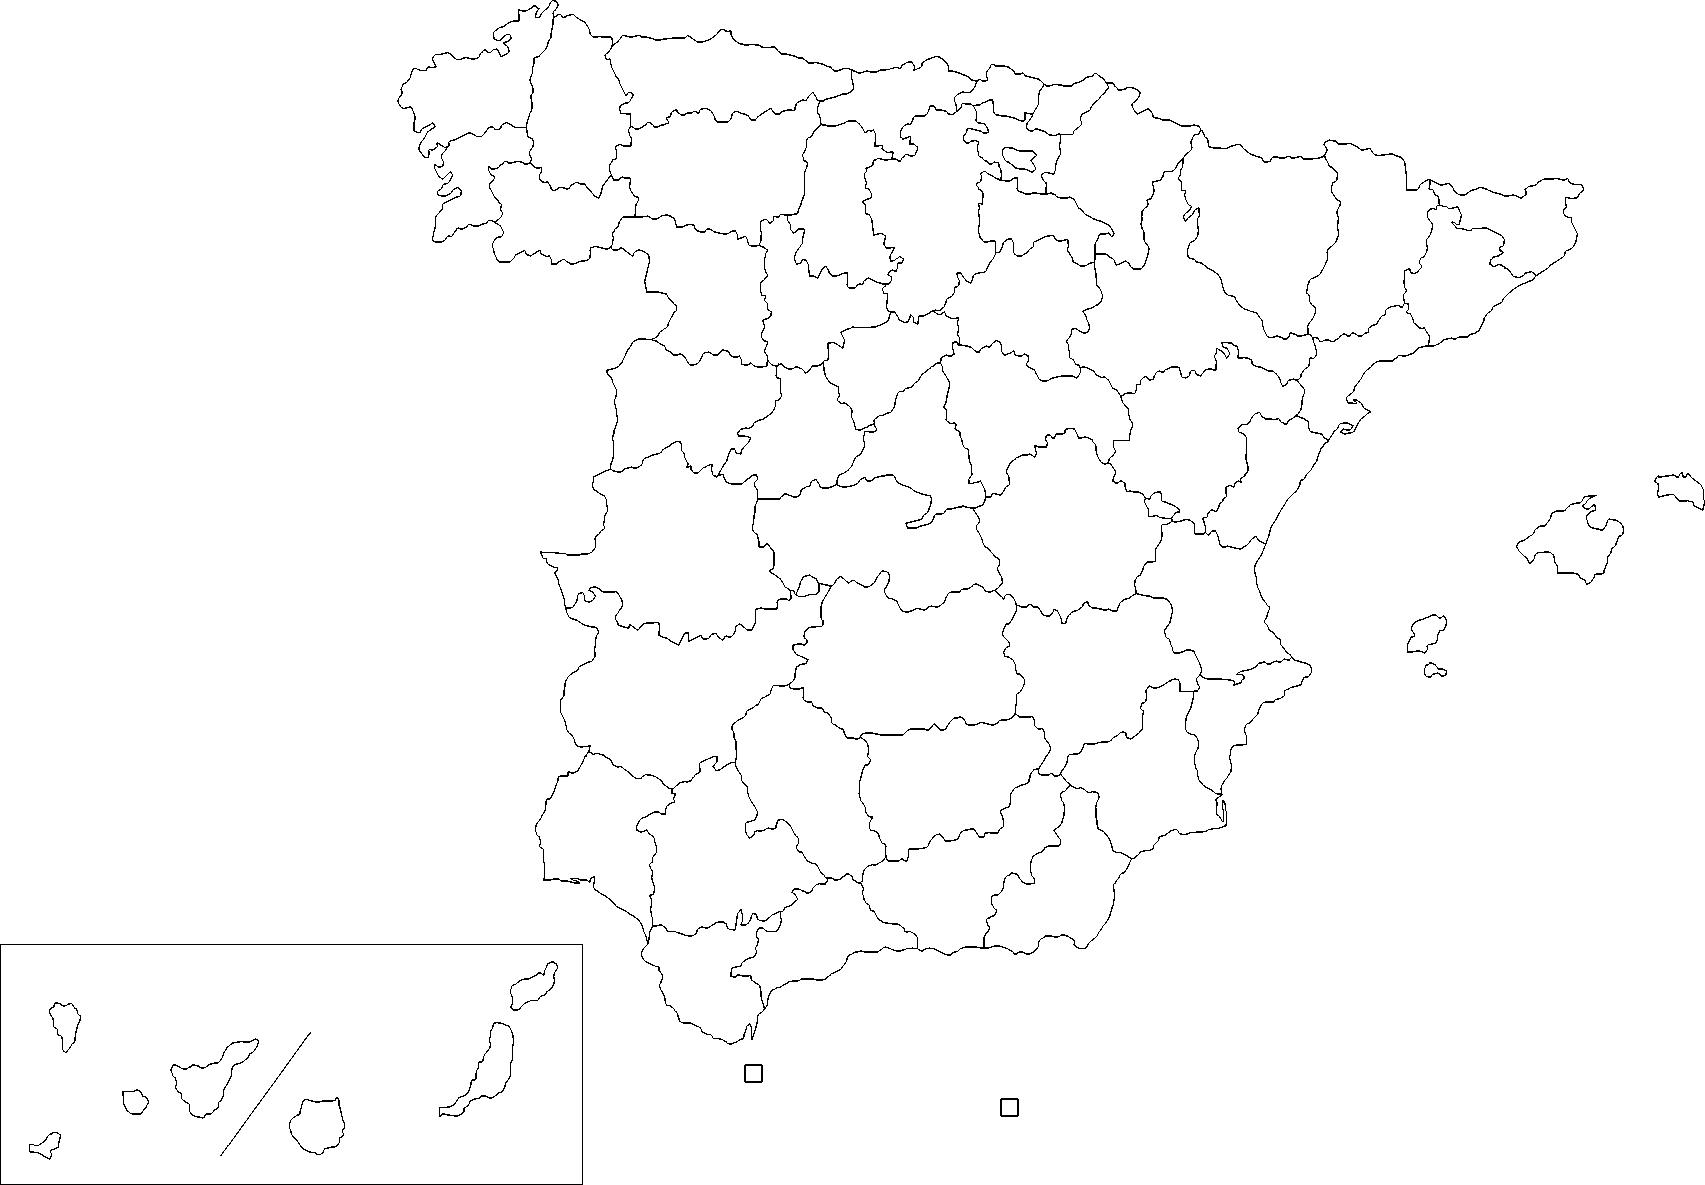 Atlas Spain Blank Map - Portugal map blank